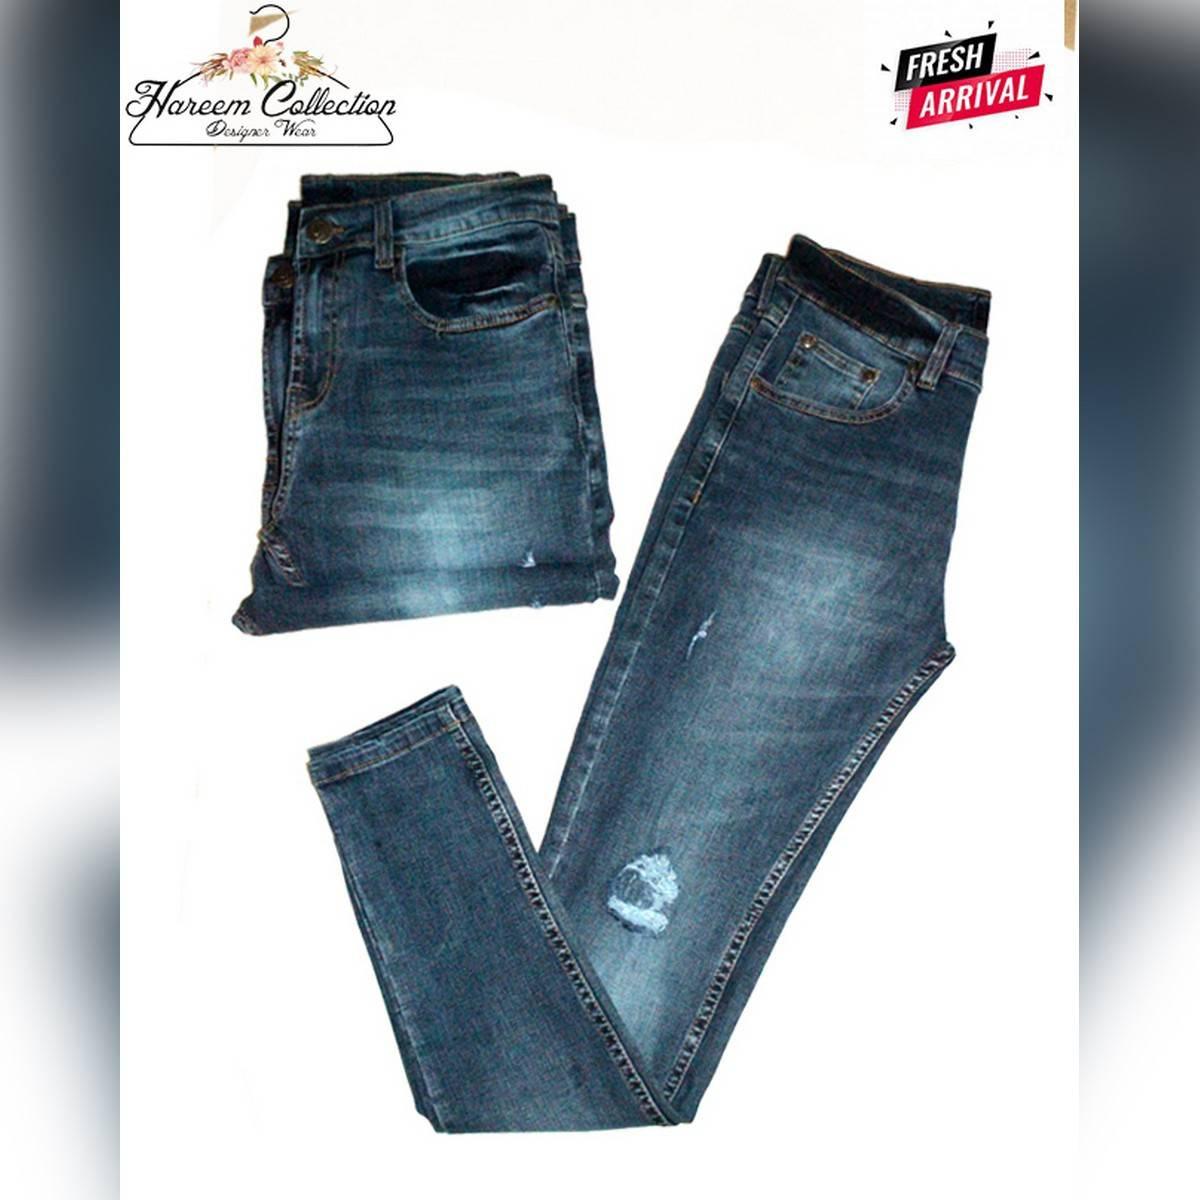 Blue Denim Stretchable Jeans For Men's